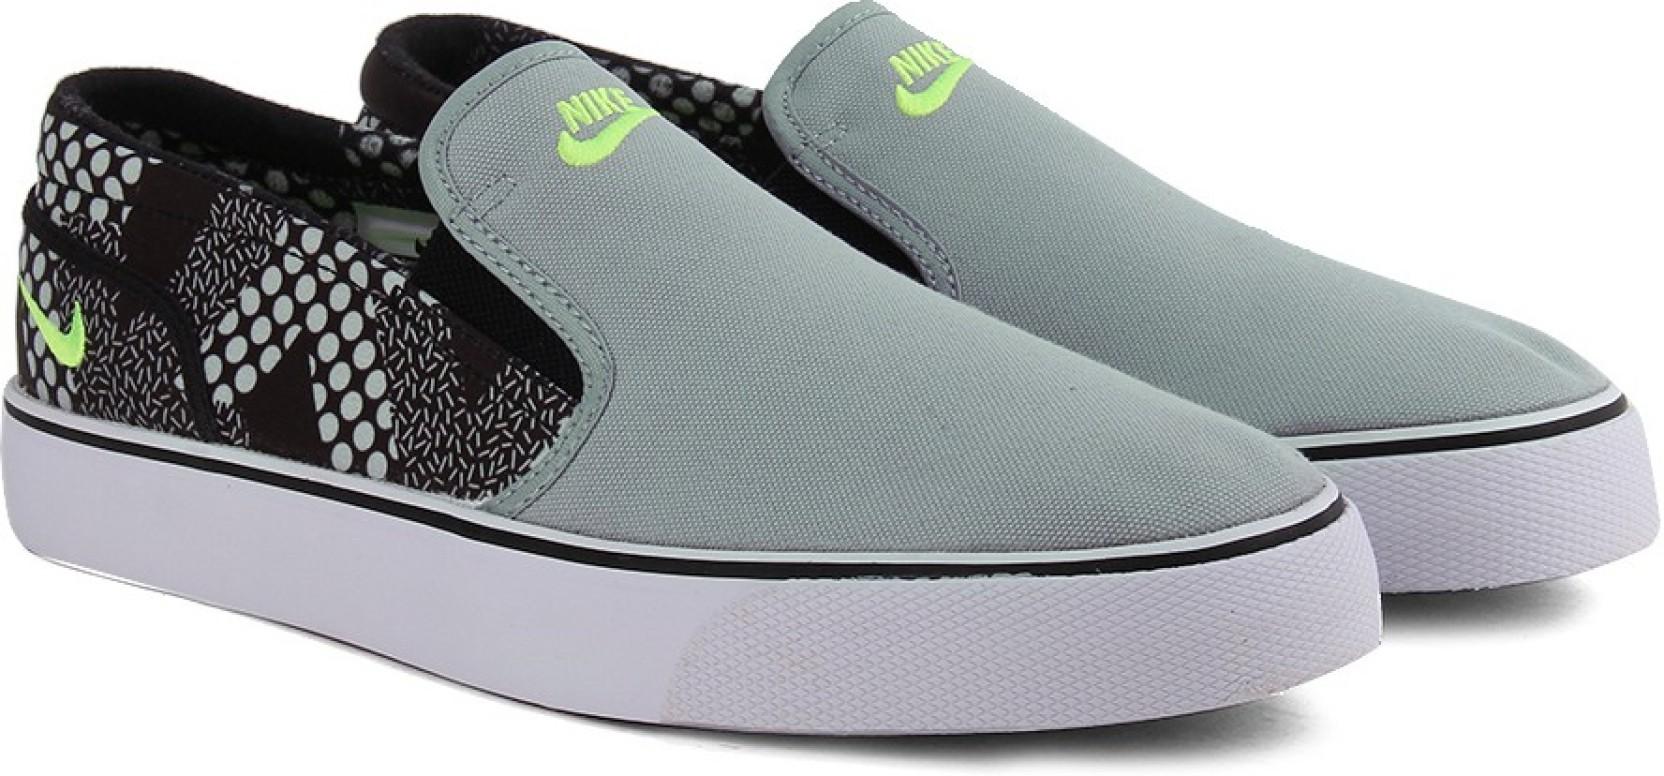 28475aa81412 ... authentic nike toki slip txt sneakers for men black grey white f4caf  826cc